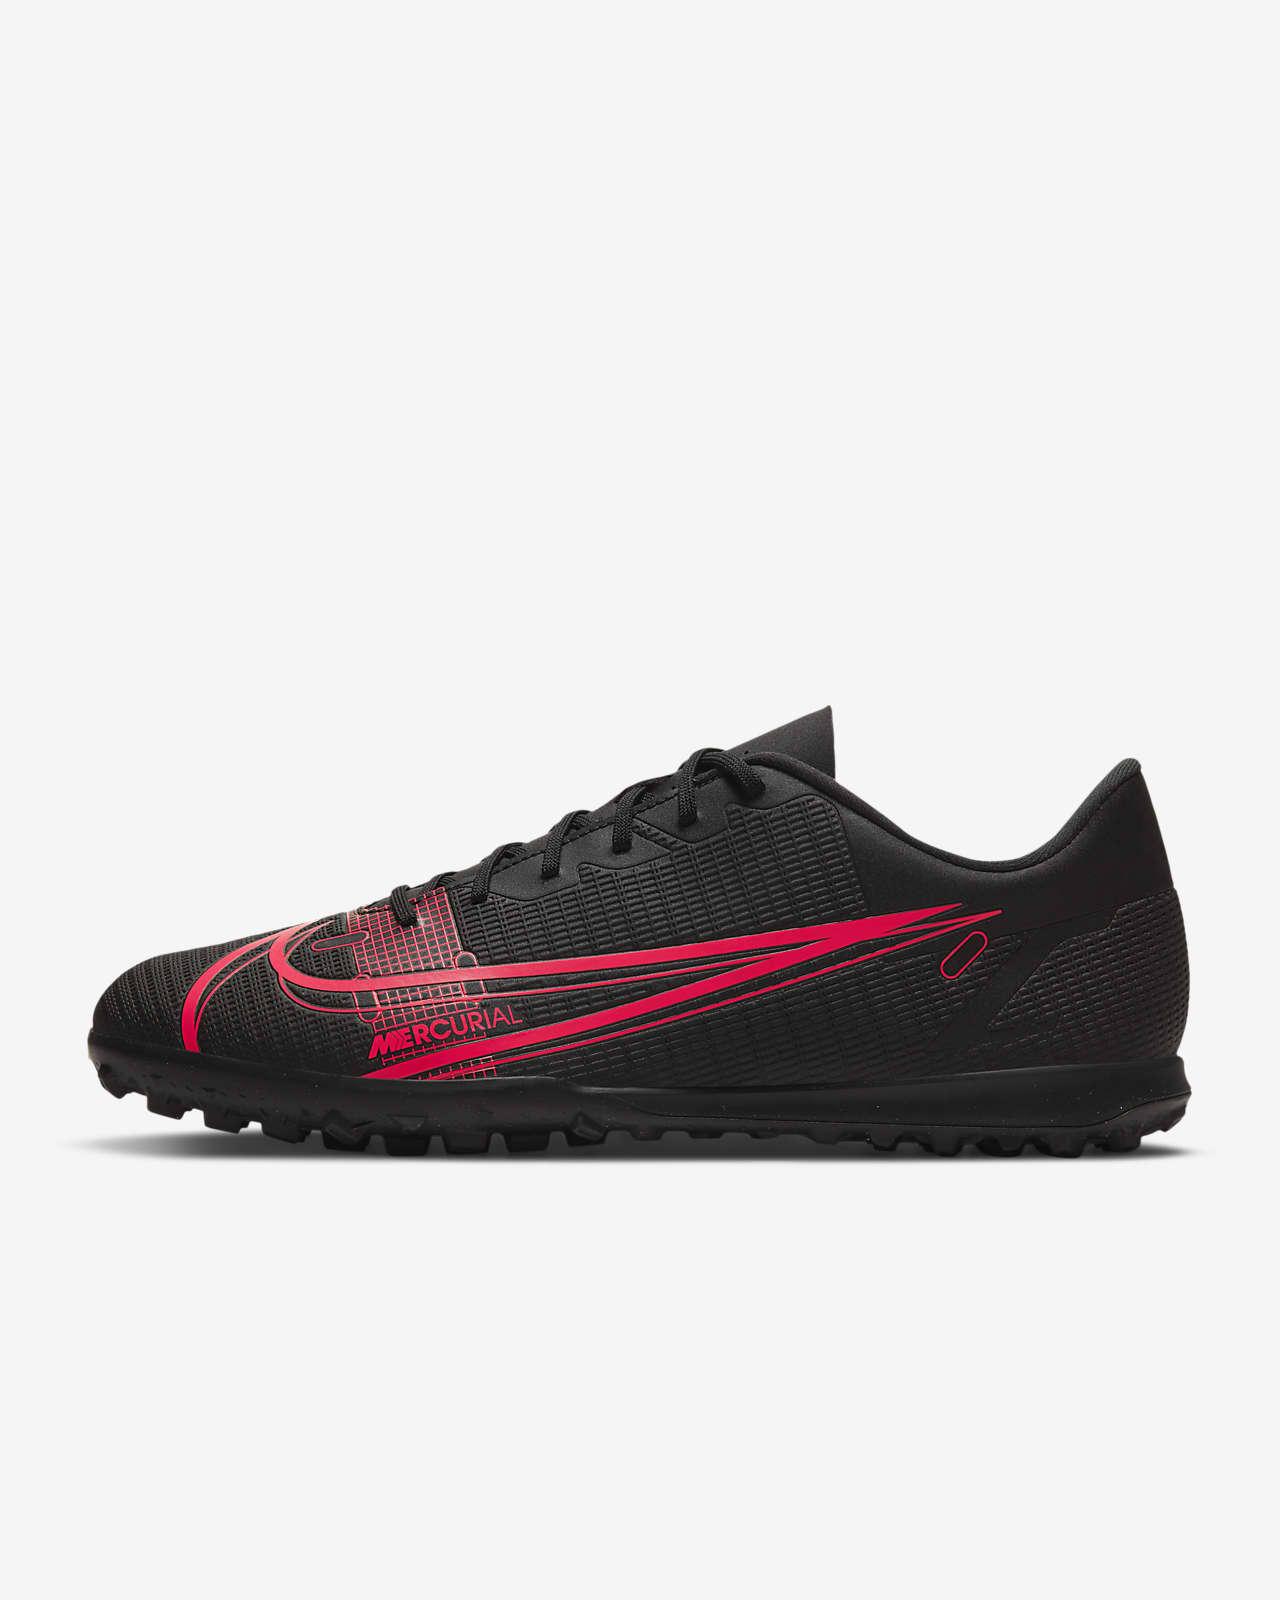 Chaussure de football pour surface synthétique Nike Mercurial Vapor 14 Club TF